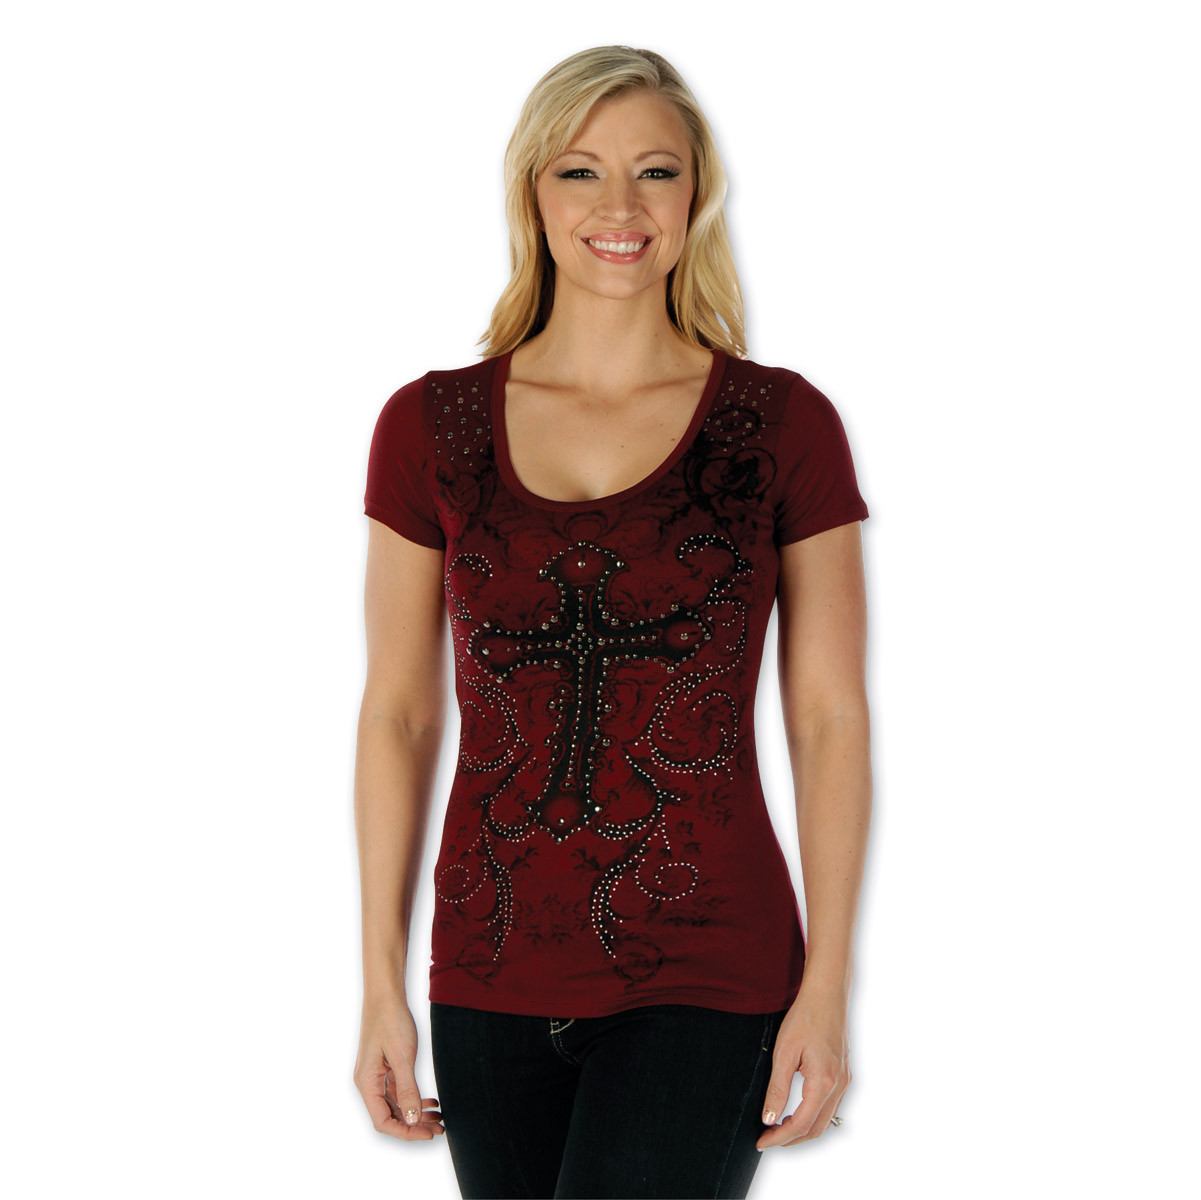 Liberty Wear Women's Jeweled Cross Burgundy T-Shirt